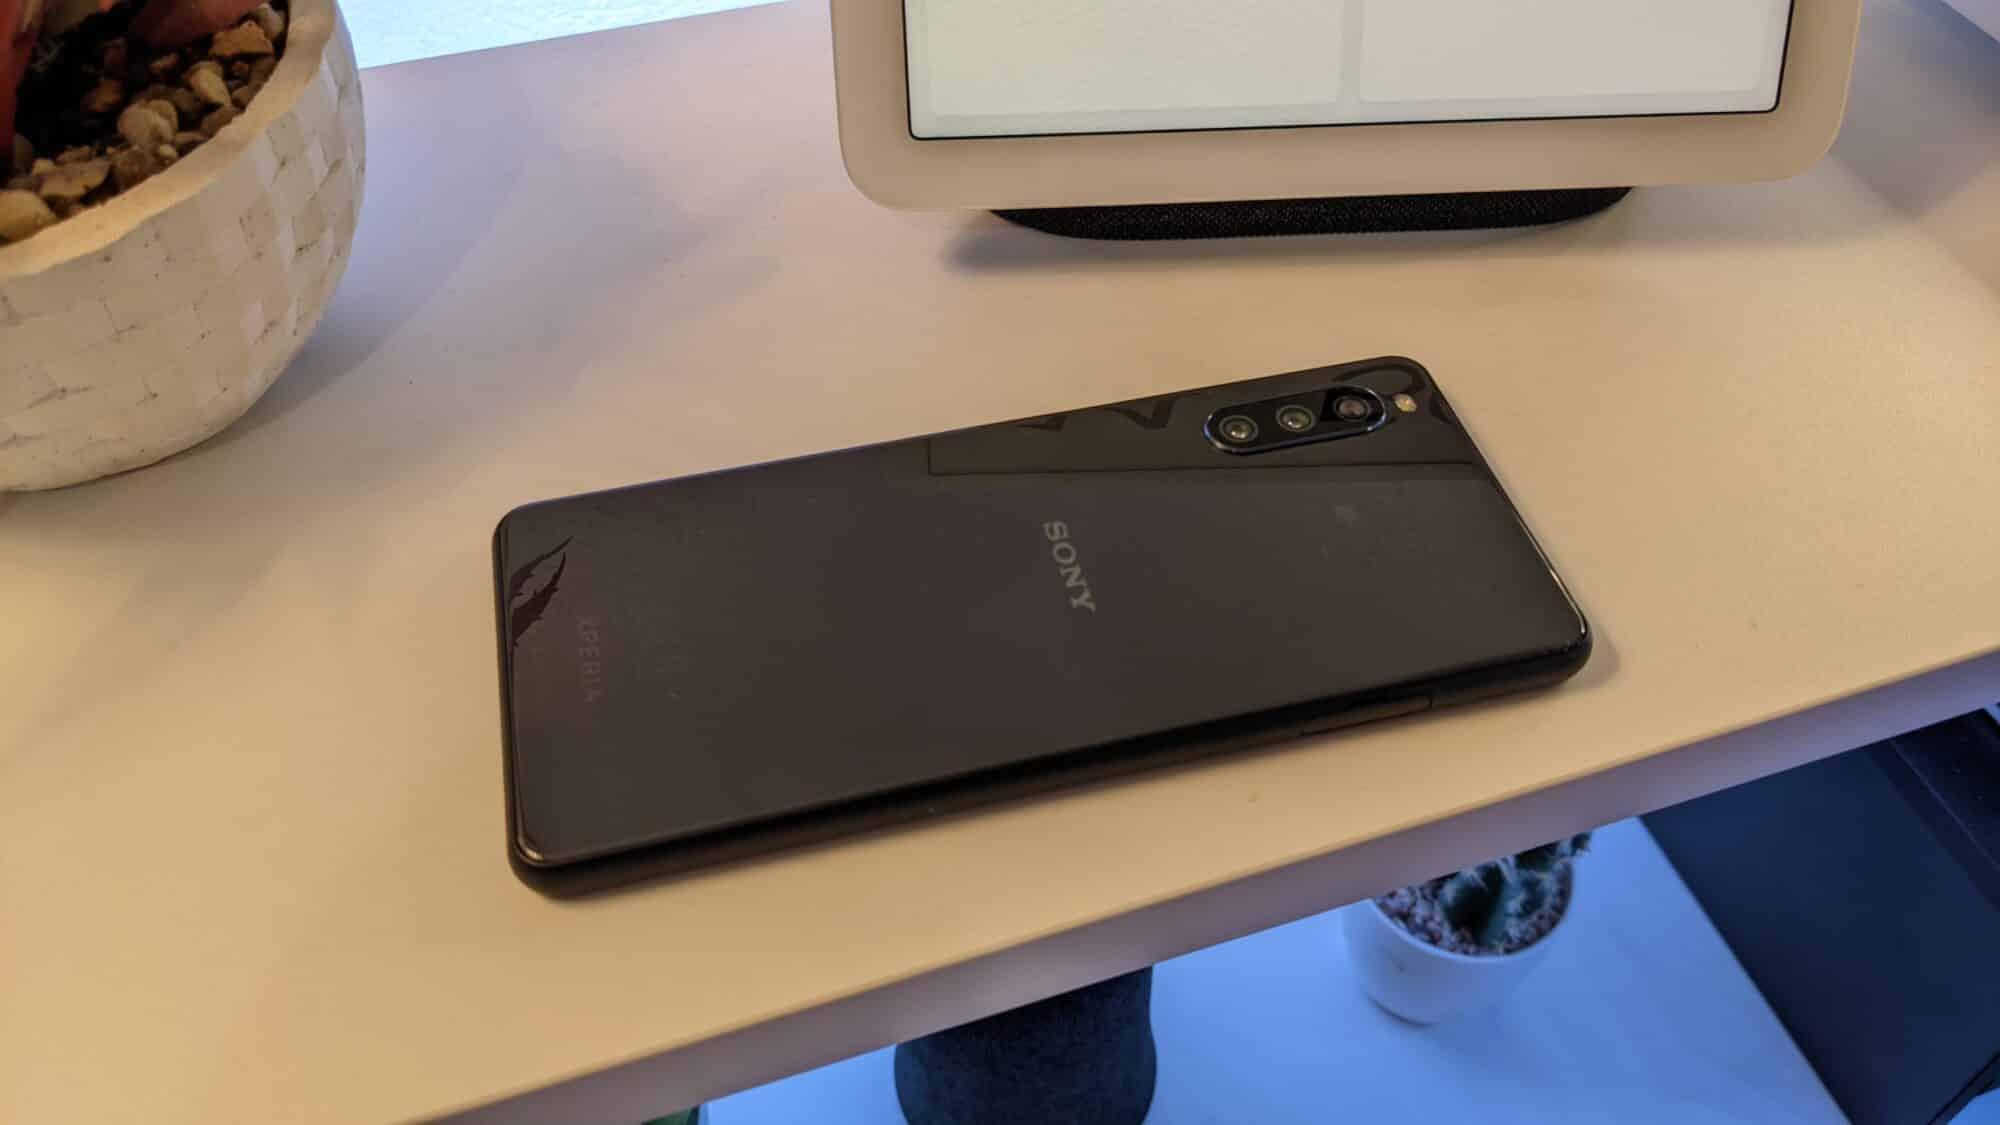 Sony Xperia 10 III, TEST – Sony Xperia 10 III : Un smartphone milieu de gamme endurant